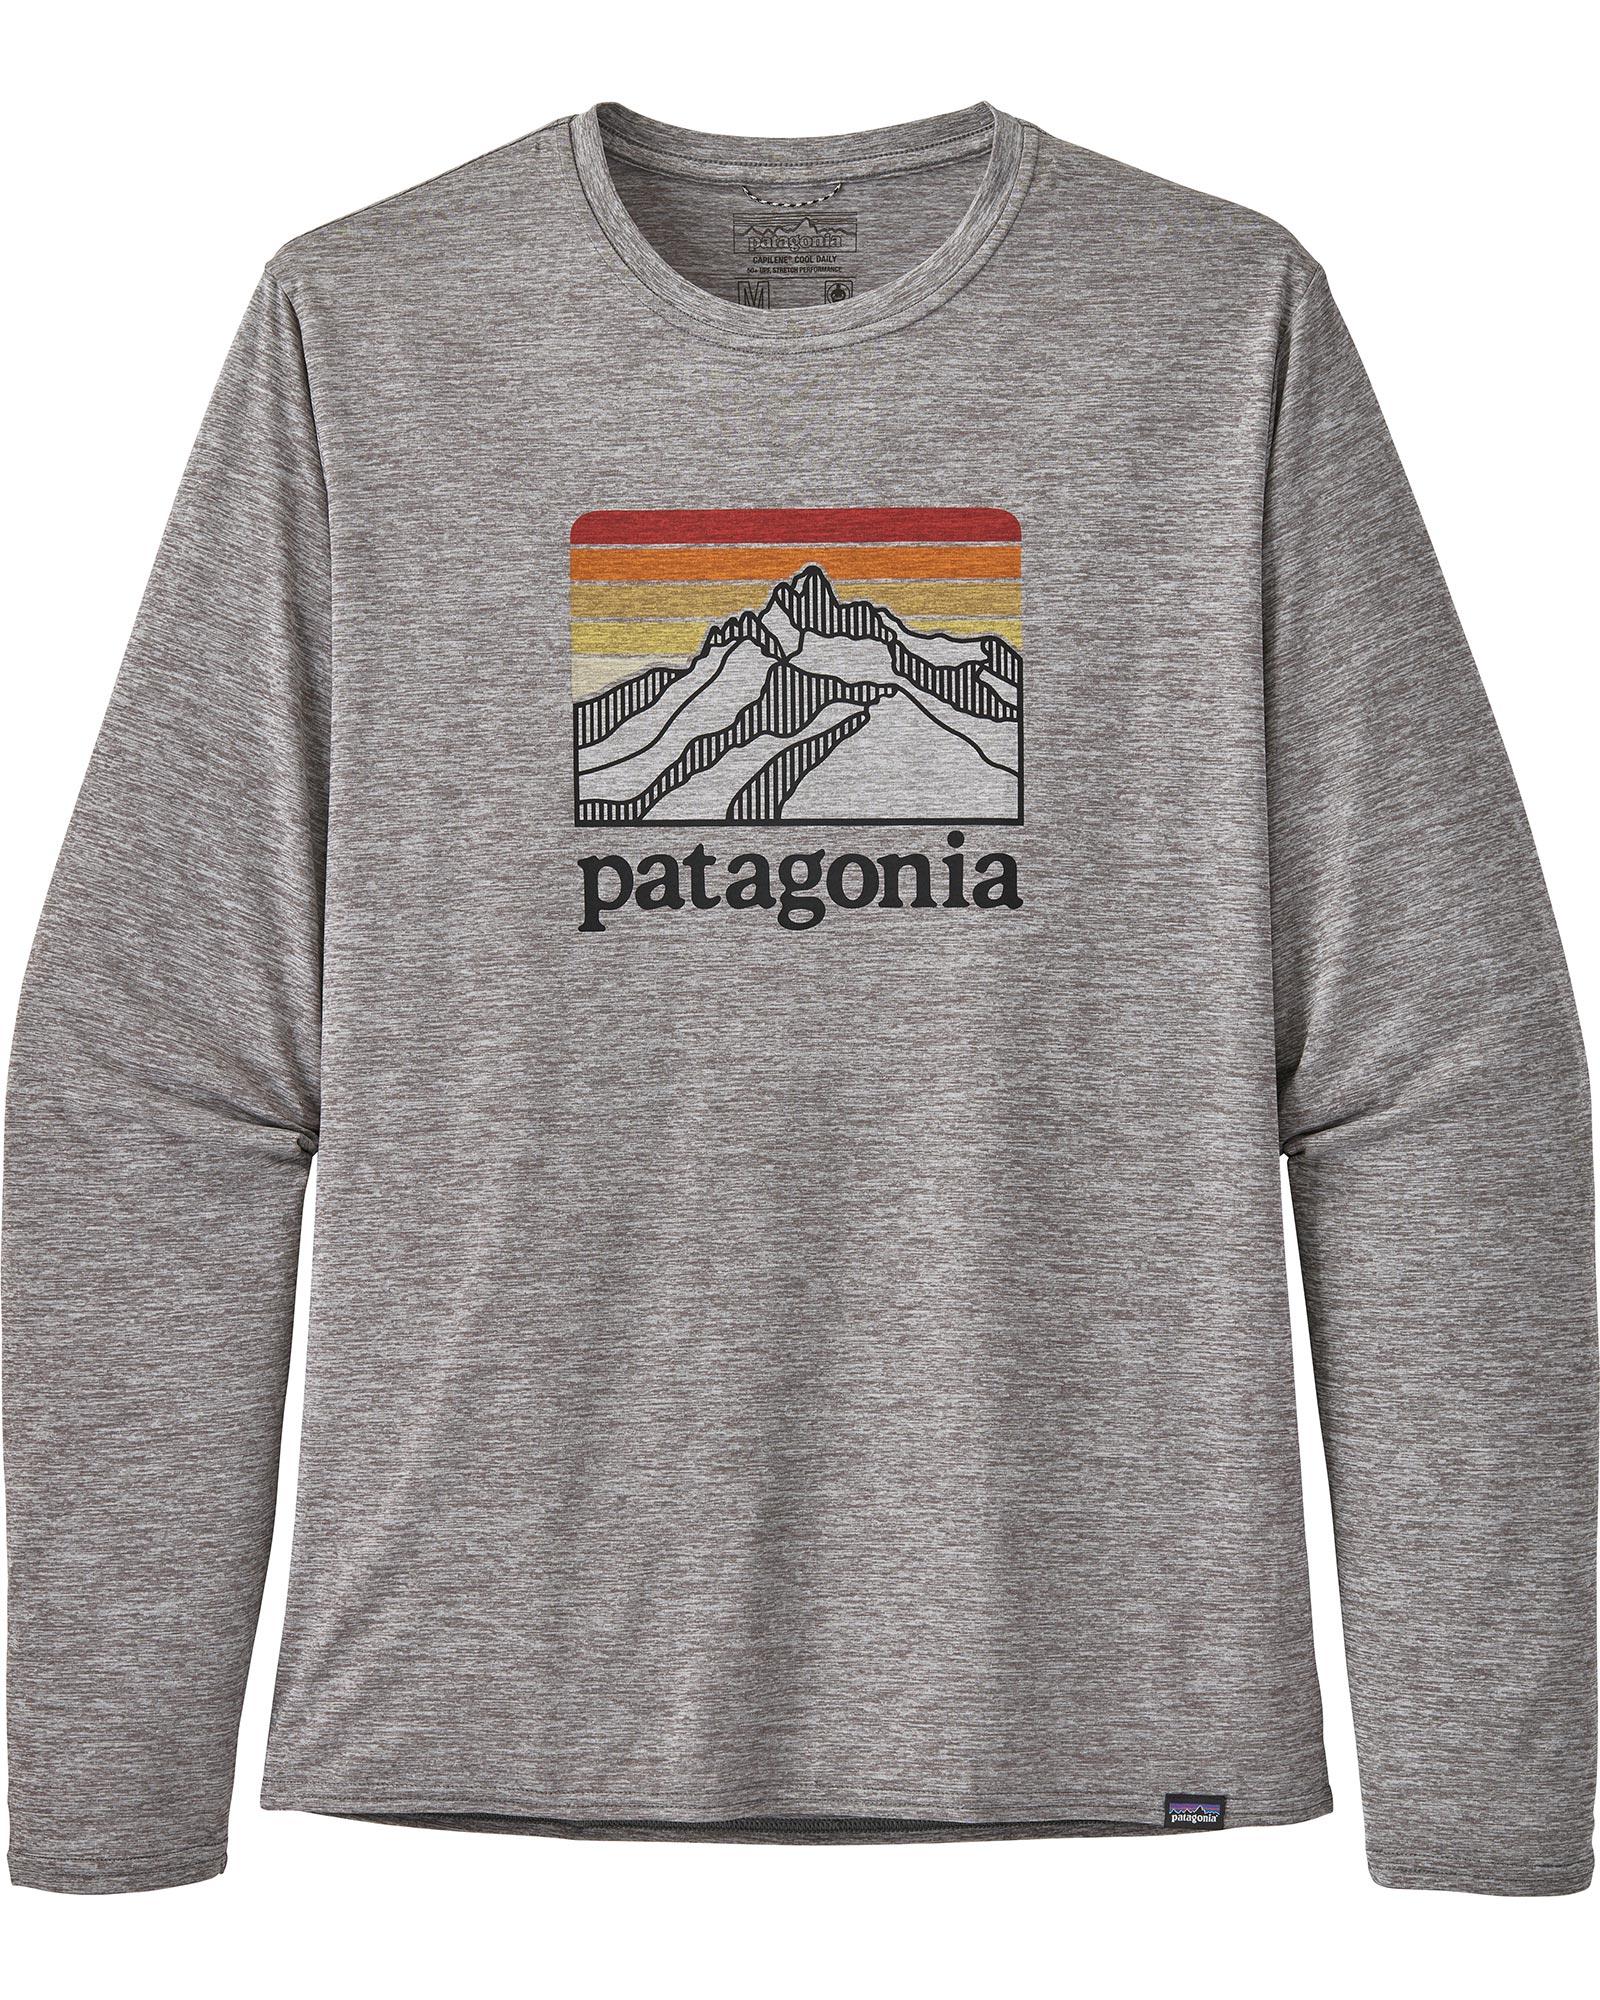 Patagonia Men's Long Sleeve Cap Cool Daily Graphic T-Shirt 0